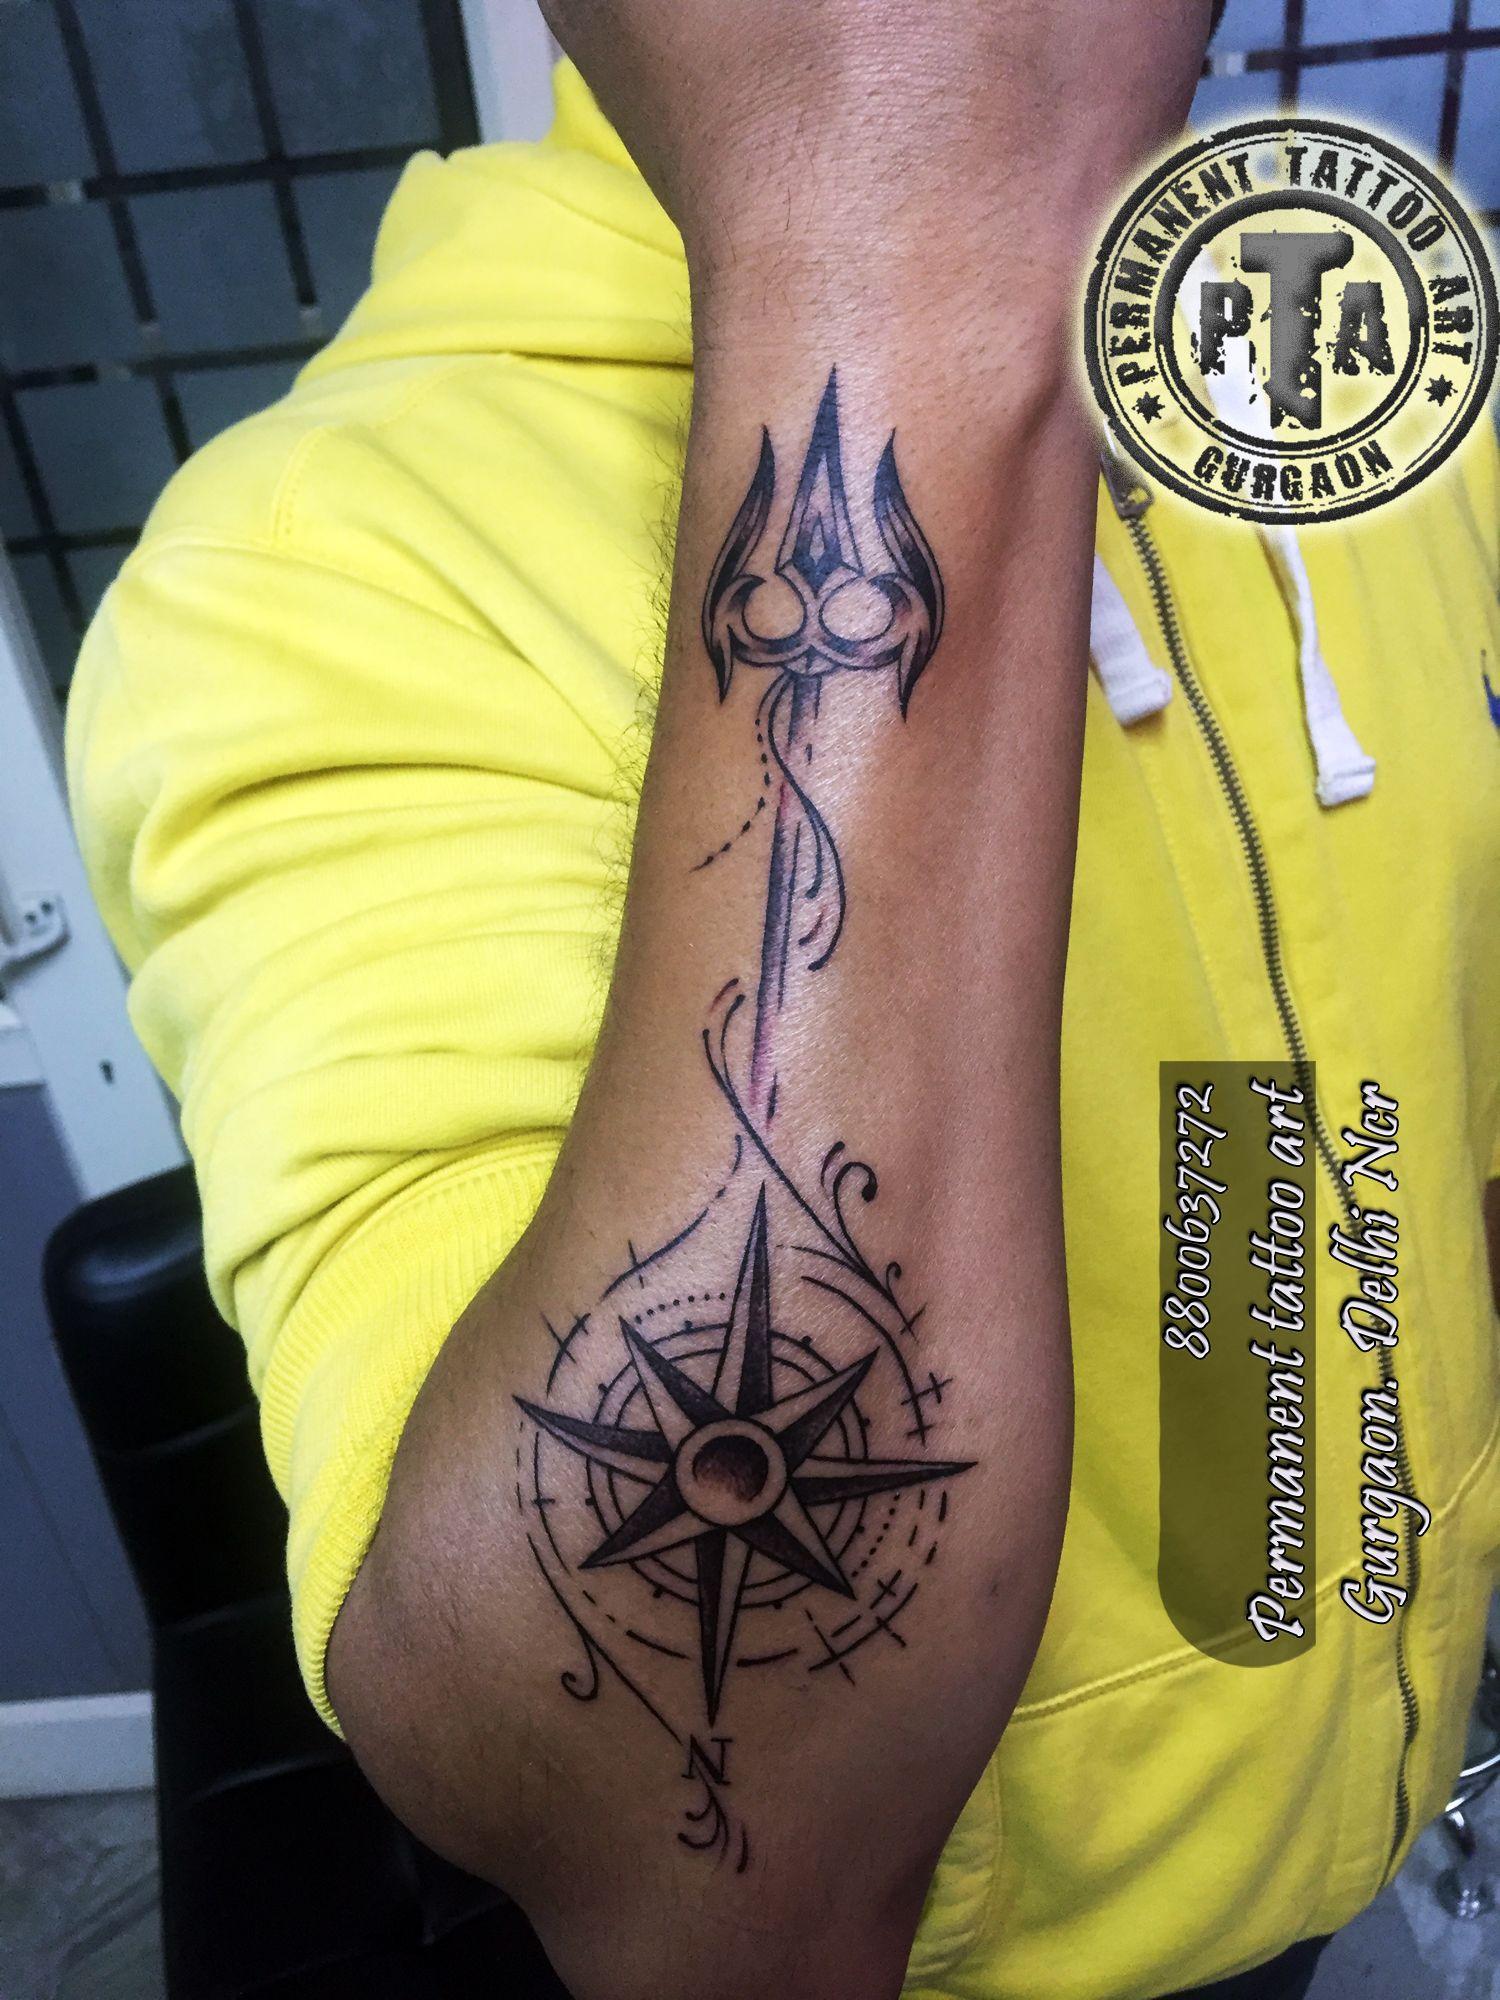 bc09e70ac Trishul tattoo, compass tattoo, compass tattoo with detail design and  trishul , shiva trishul tattoo, religious tattoo Done by - Deepak Kalra at  Permanent ...